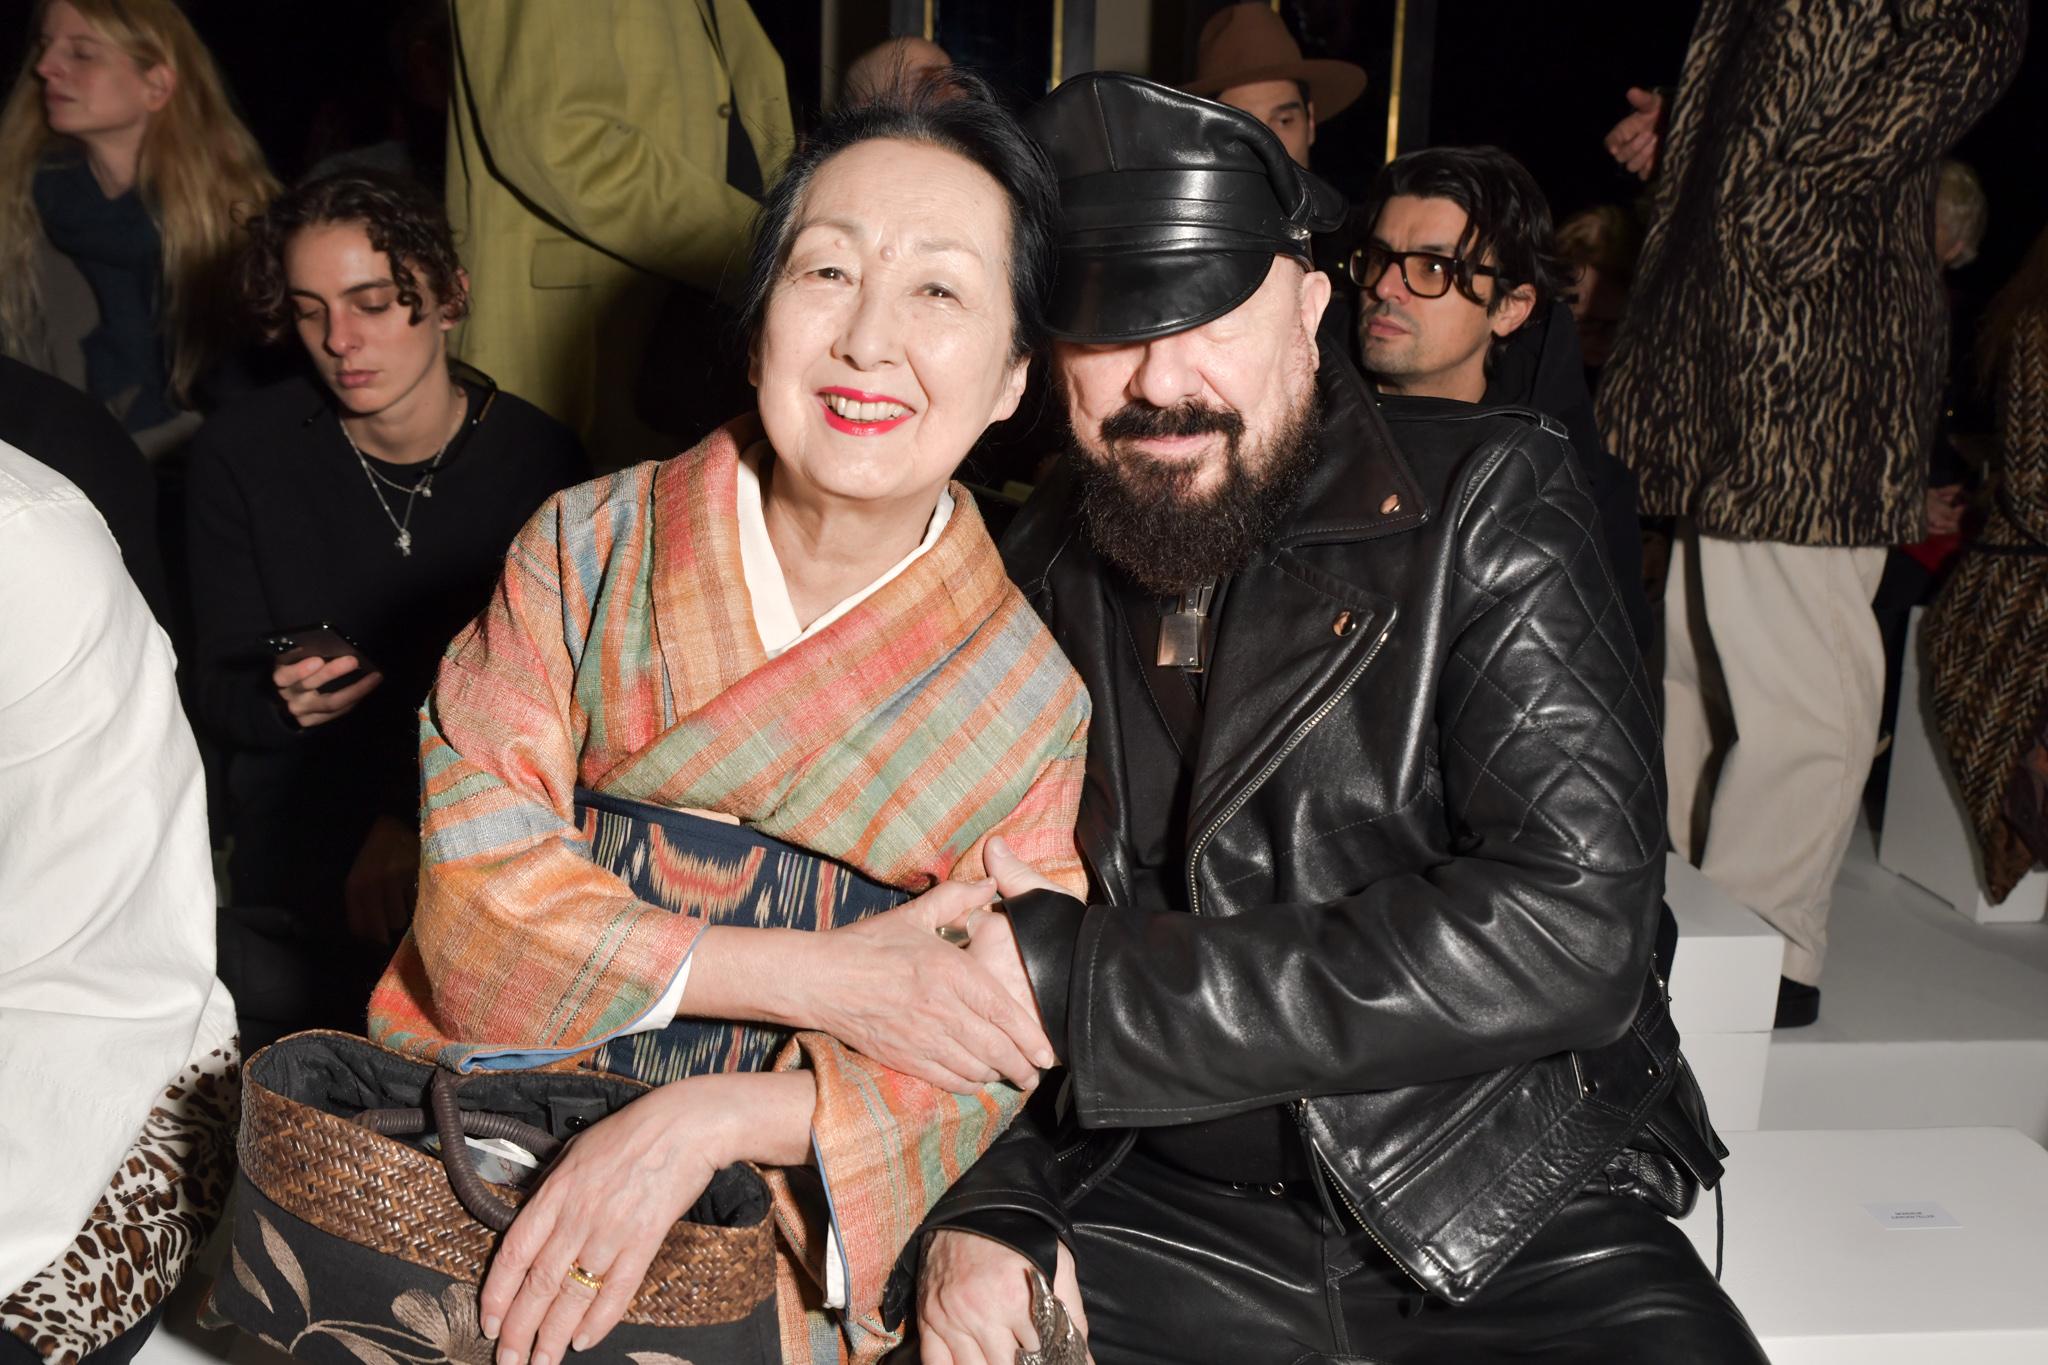 Setsuko De Rola Klossowska and Peter Marino in the front row